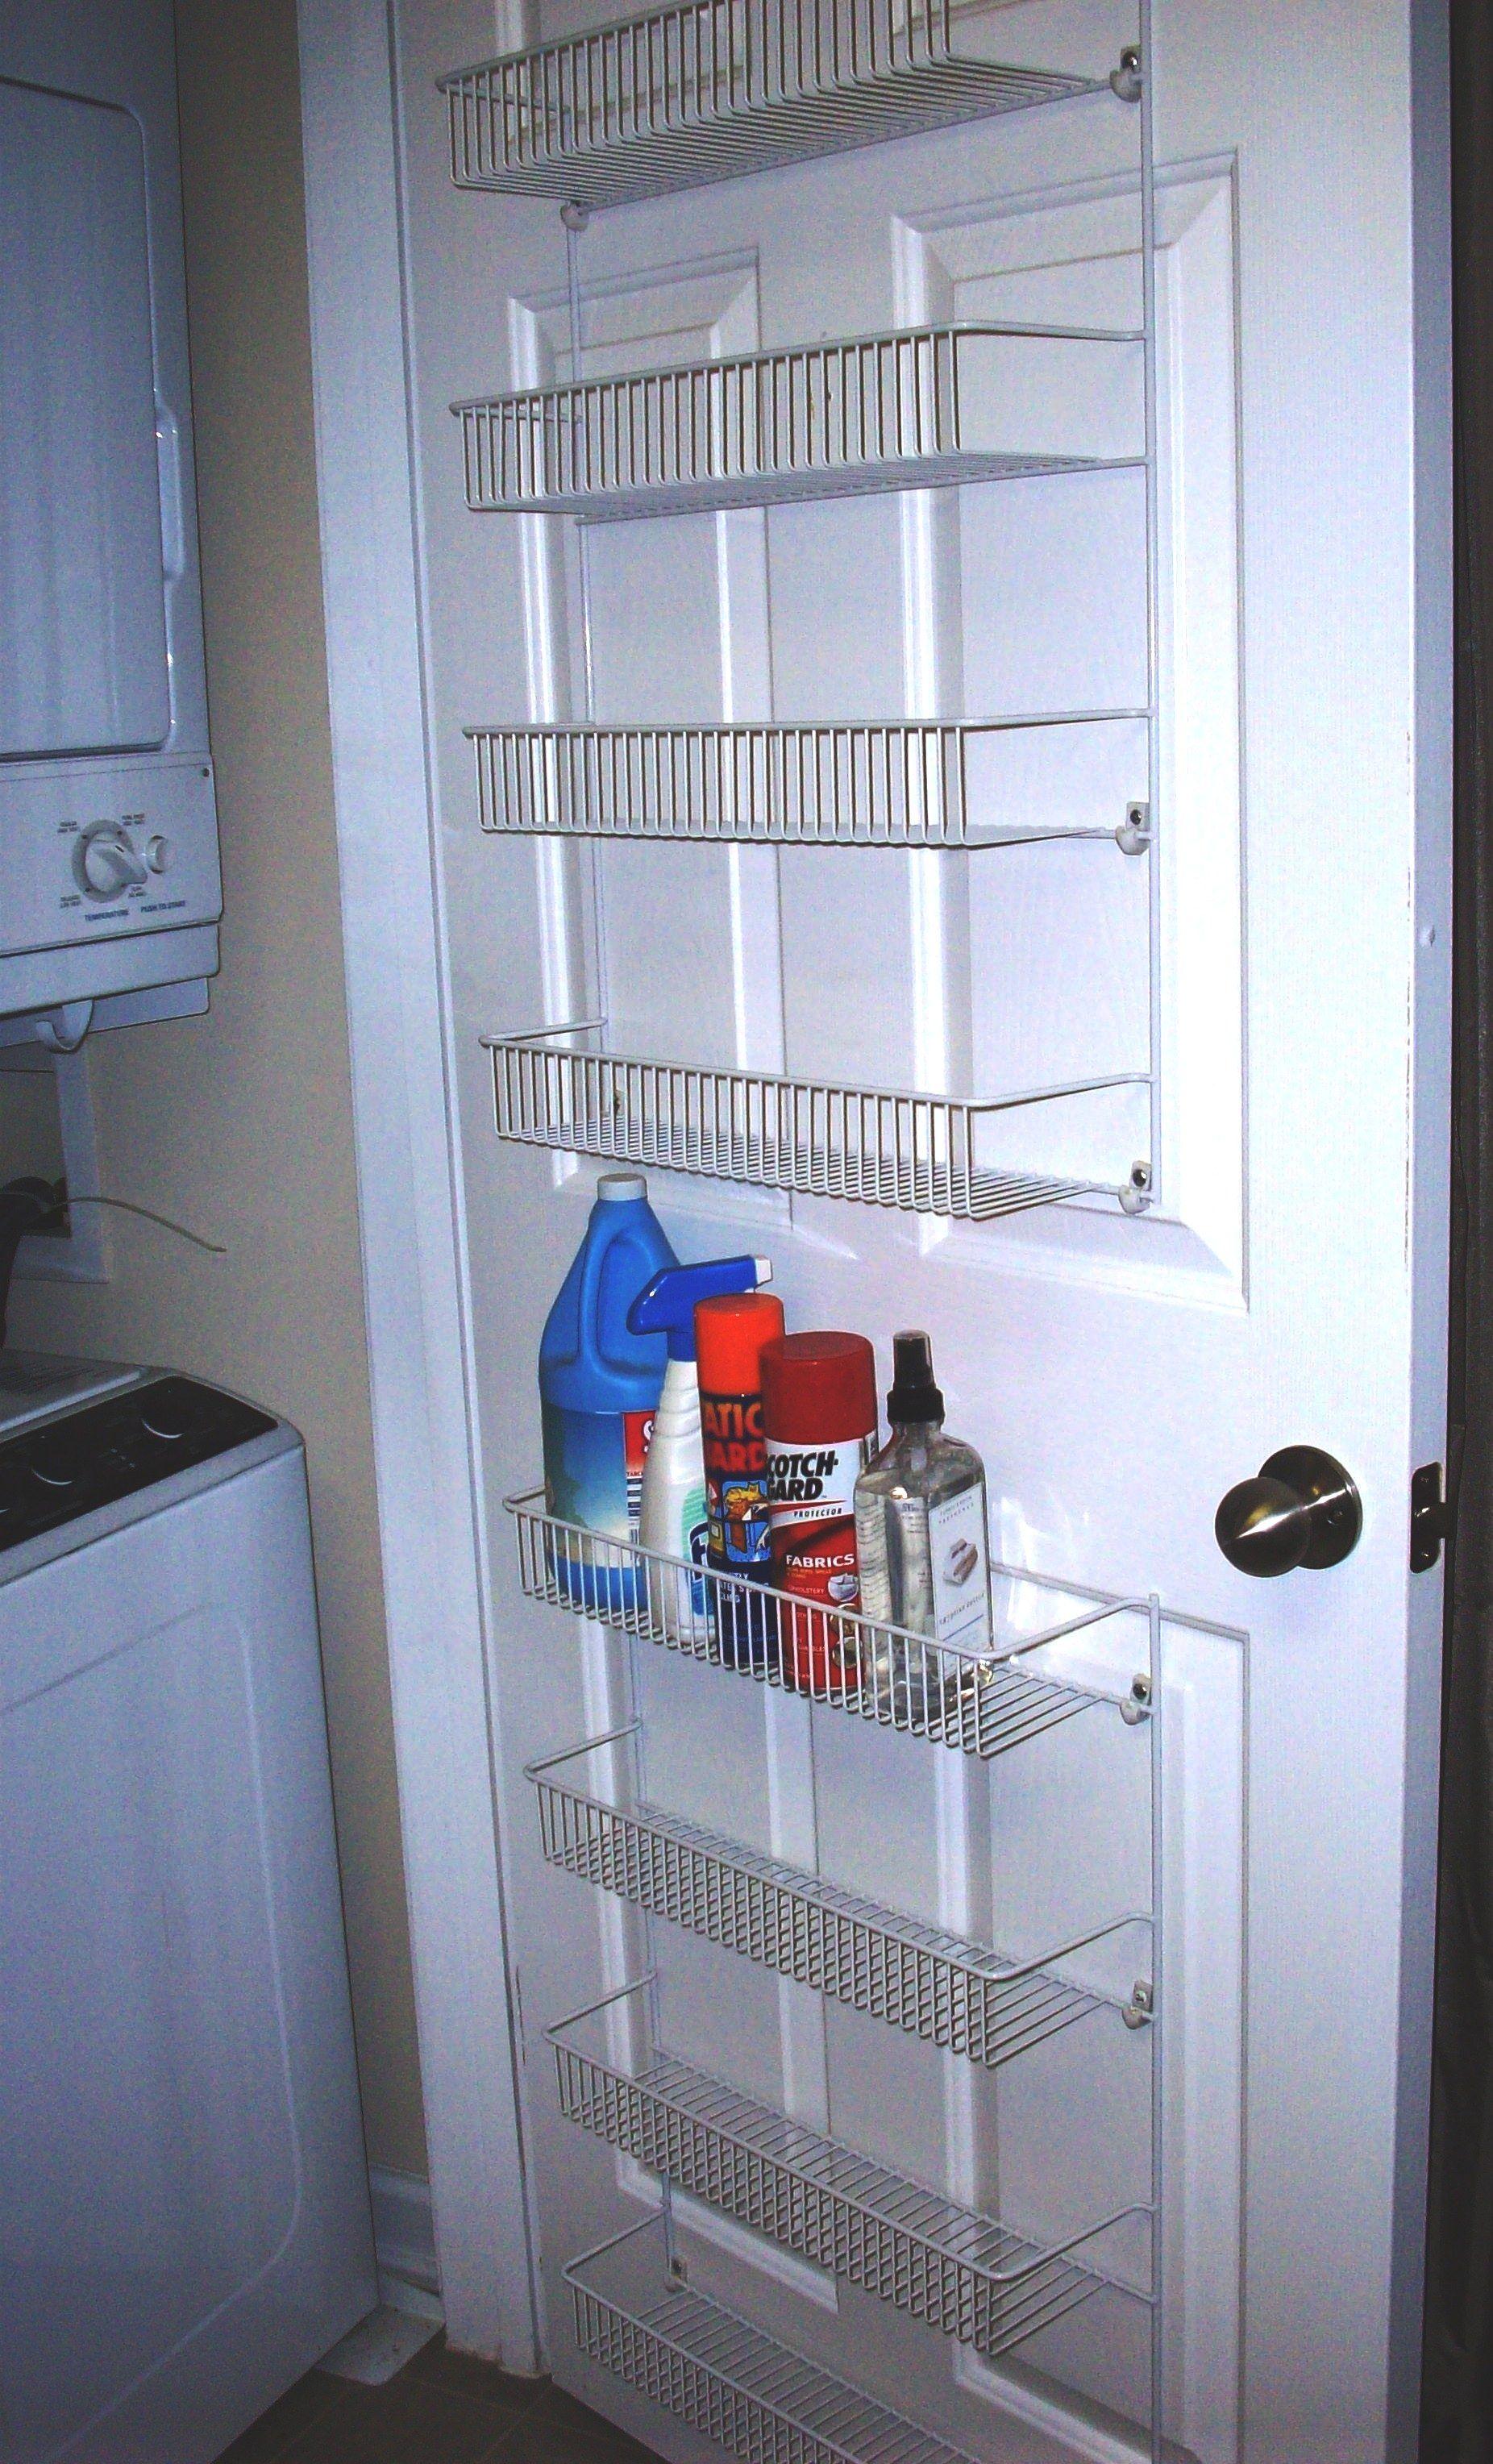 Laundry Room Door Storage Great Idea Closet Door Storage Laundry Room Storage Behind Door Storage